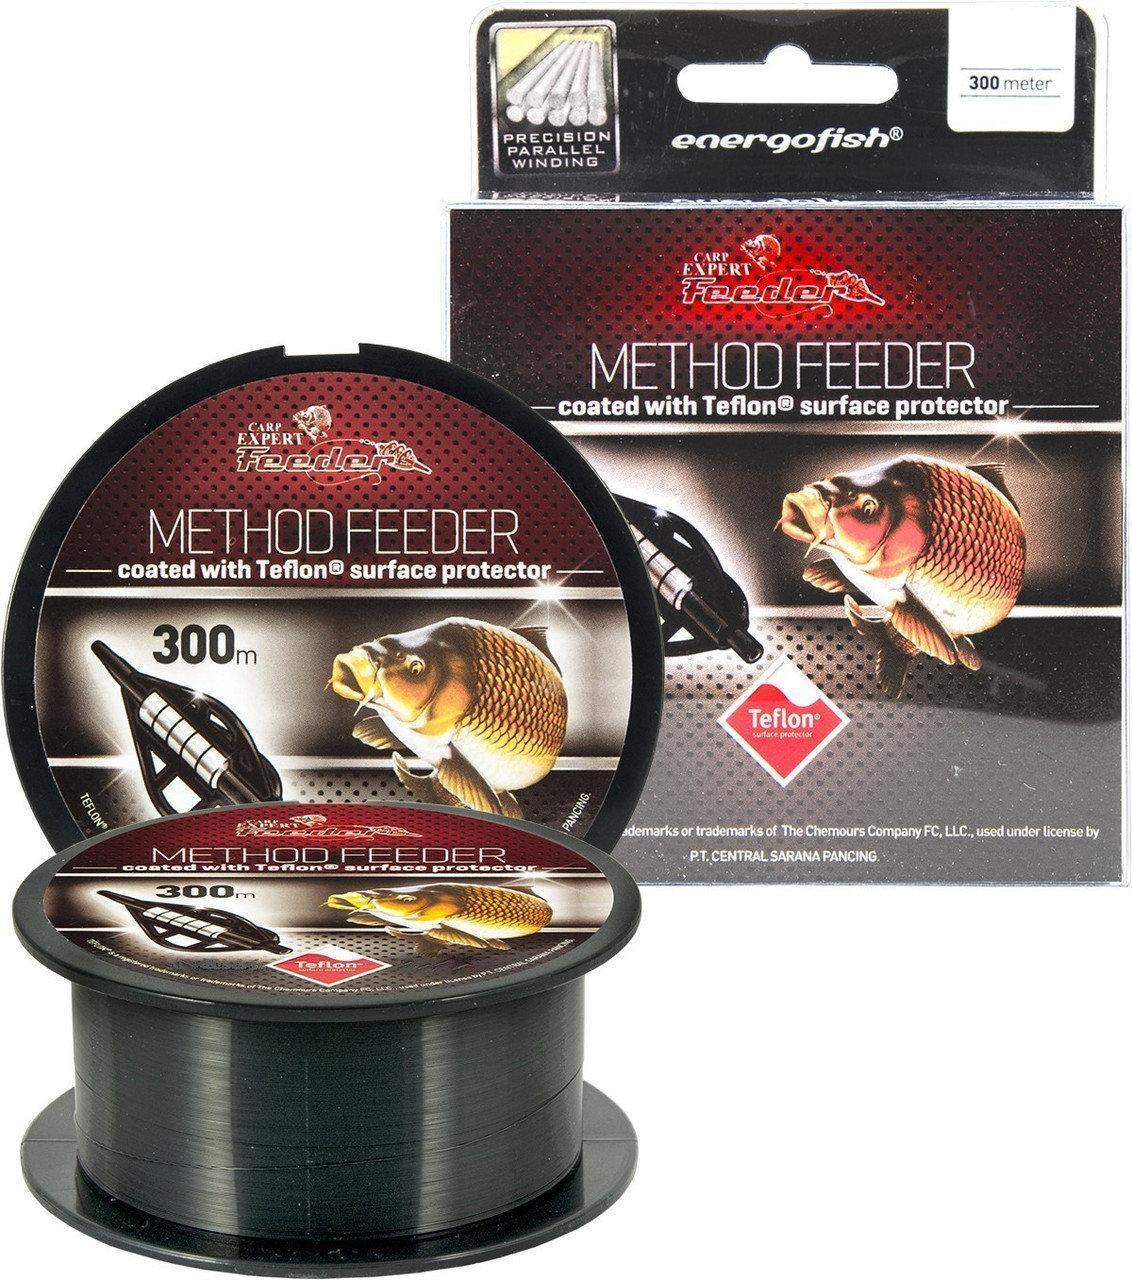 Леска Carp Expert Method Feeder Teflon Coated Black 300m 0.28mm